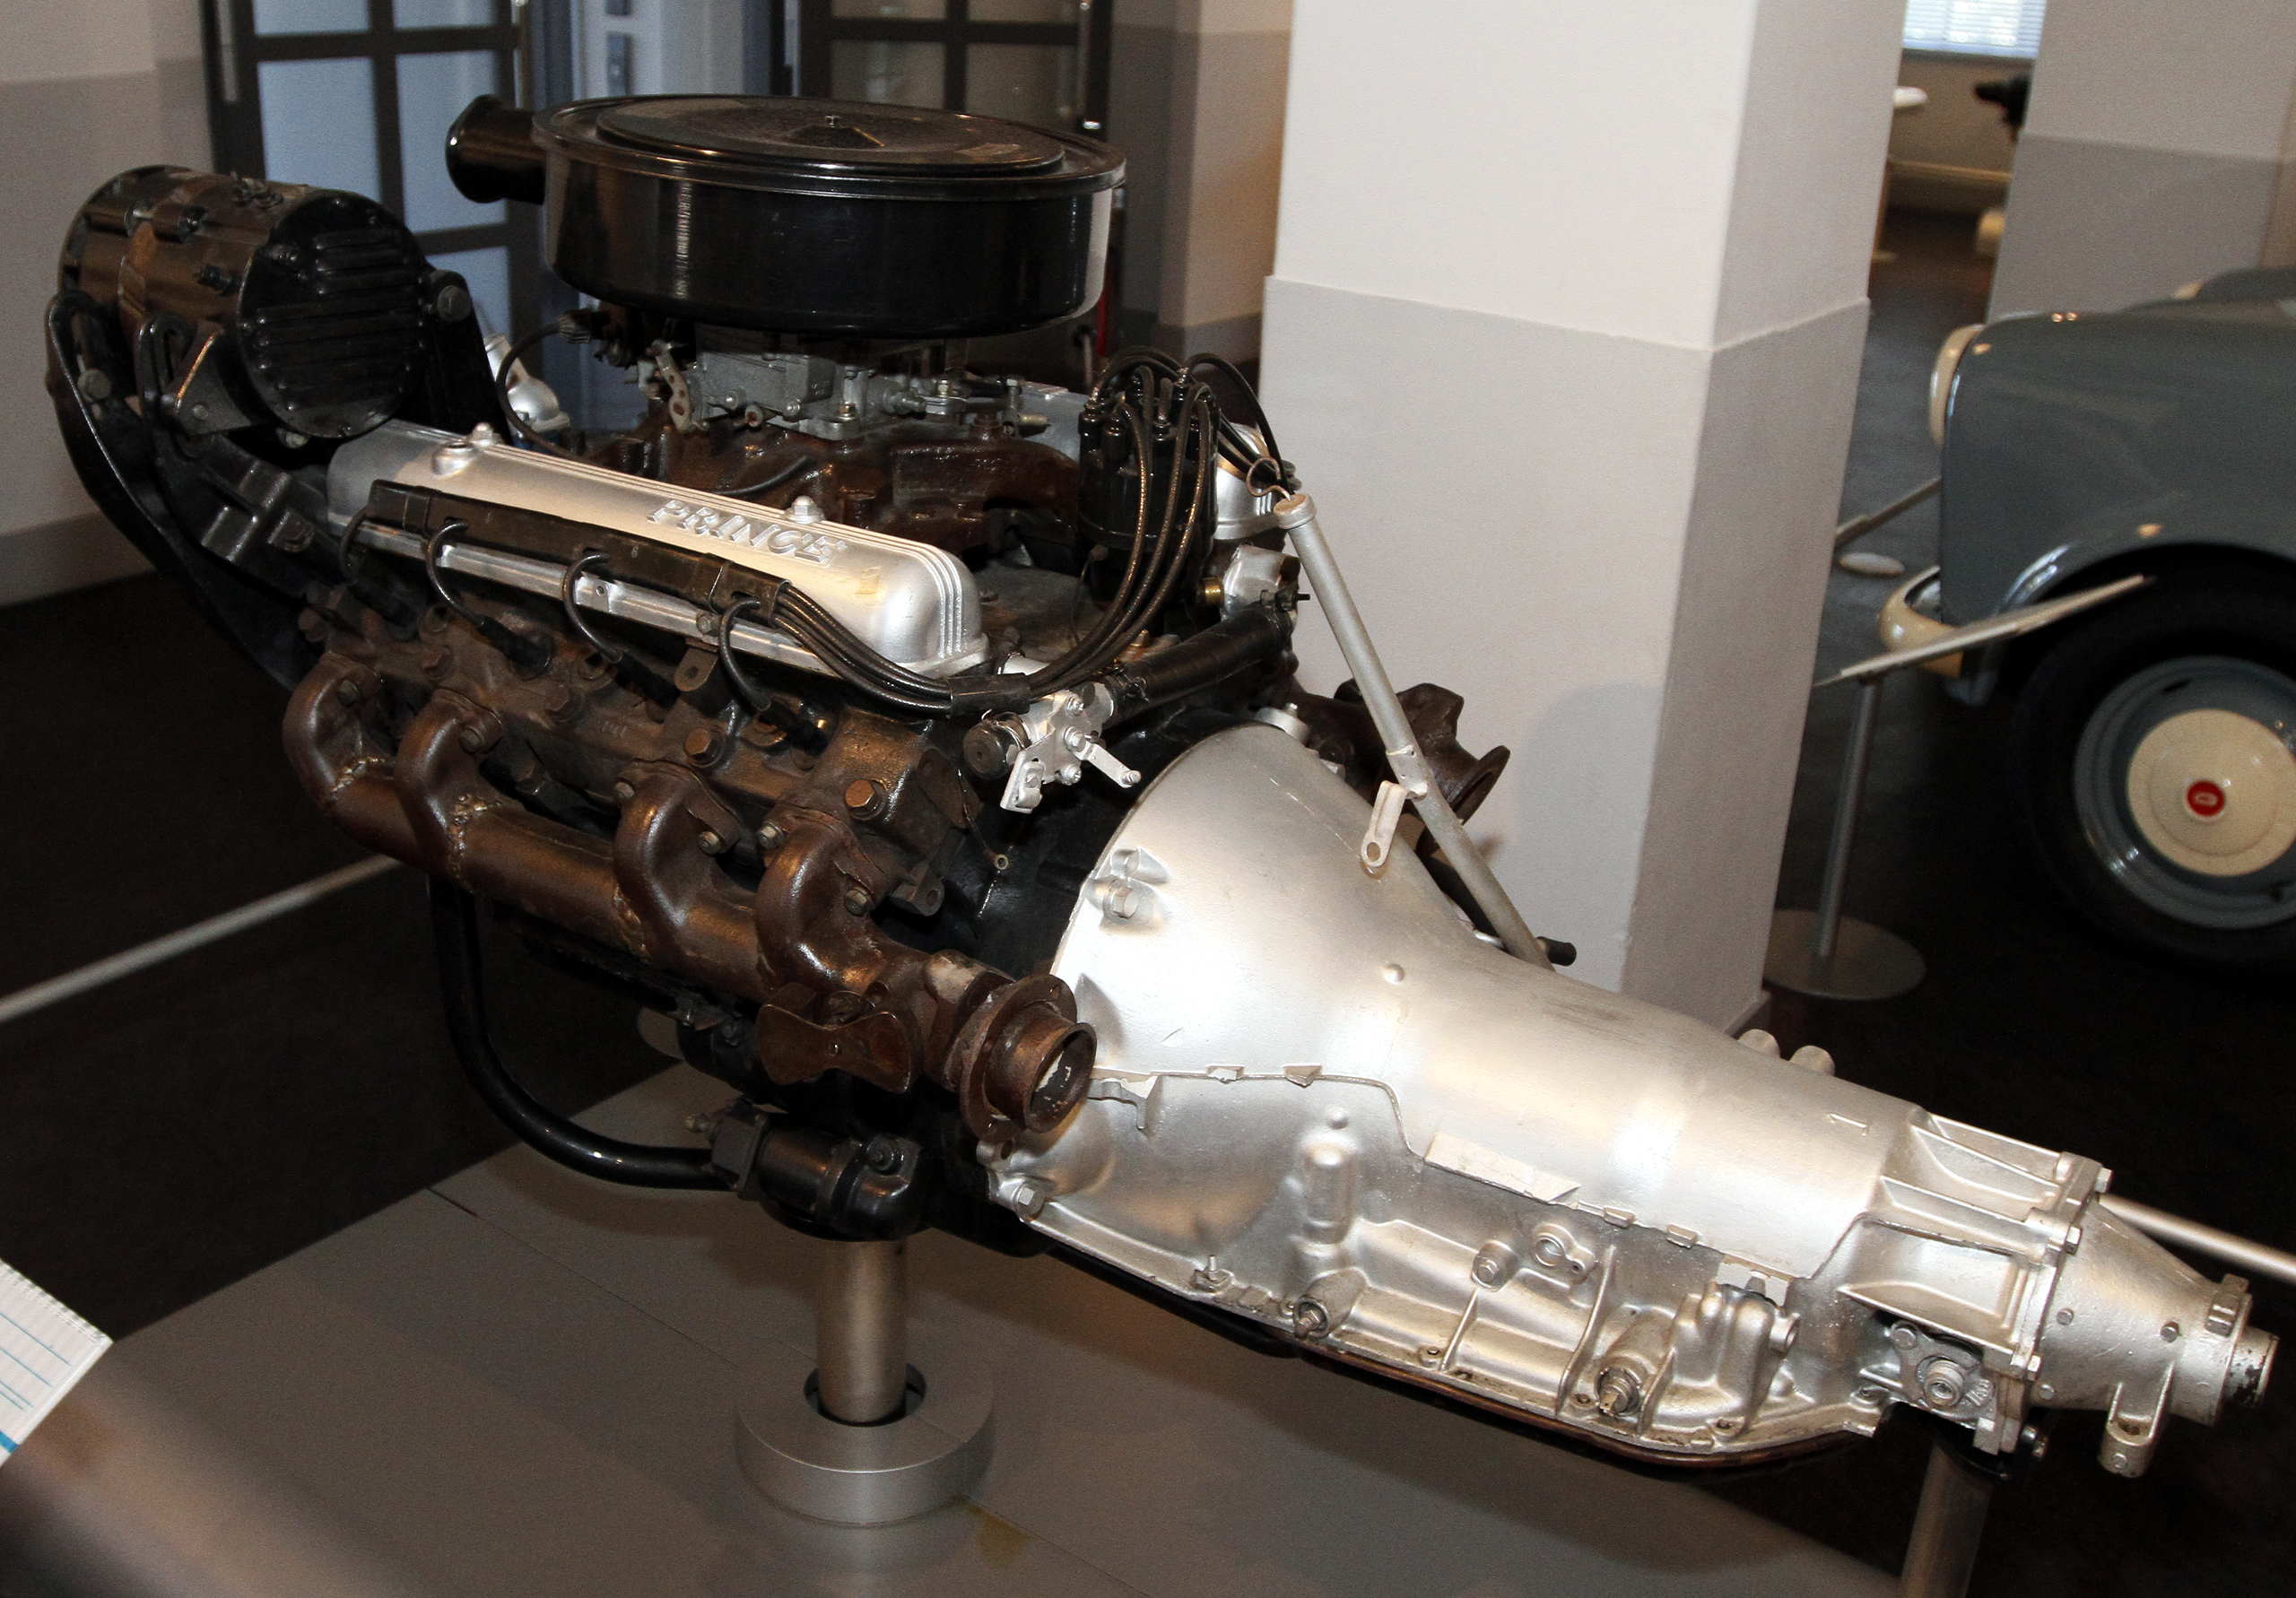 File 1967 nissan w64 engine left nissan engine museum jpg